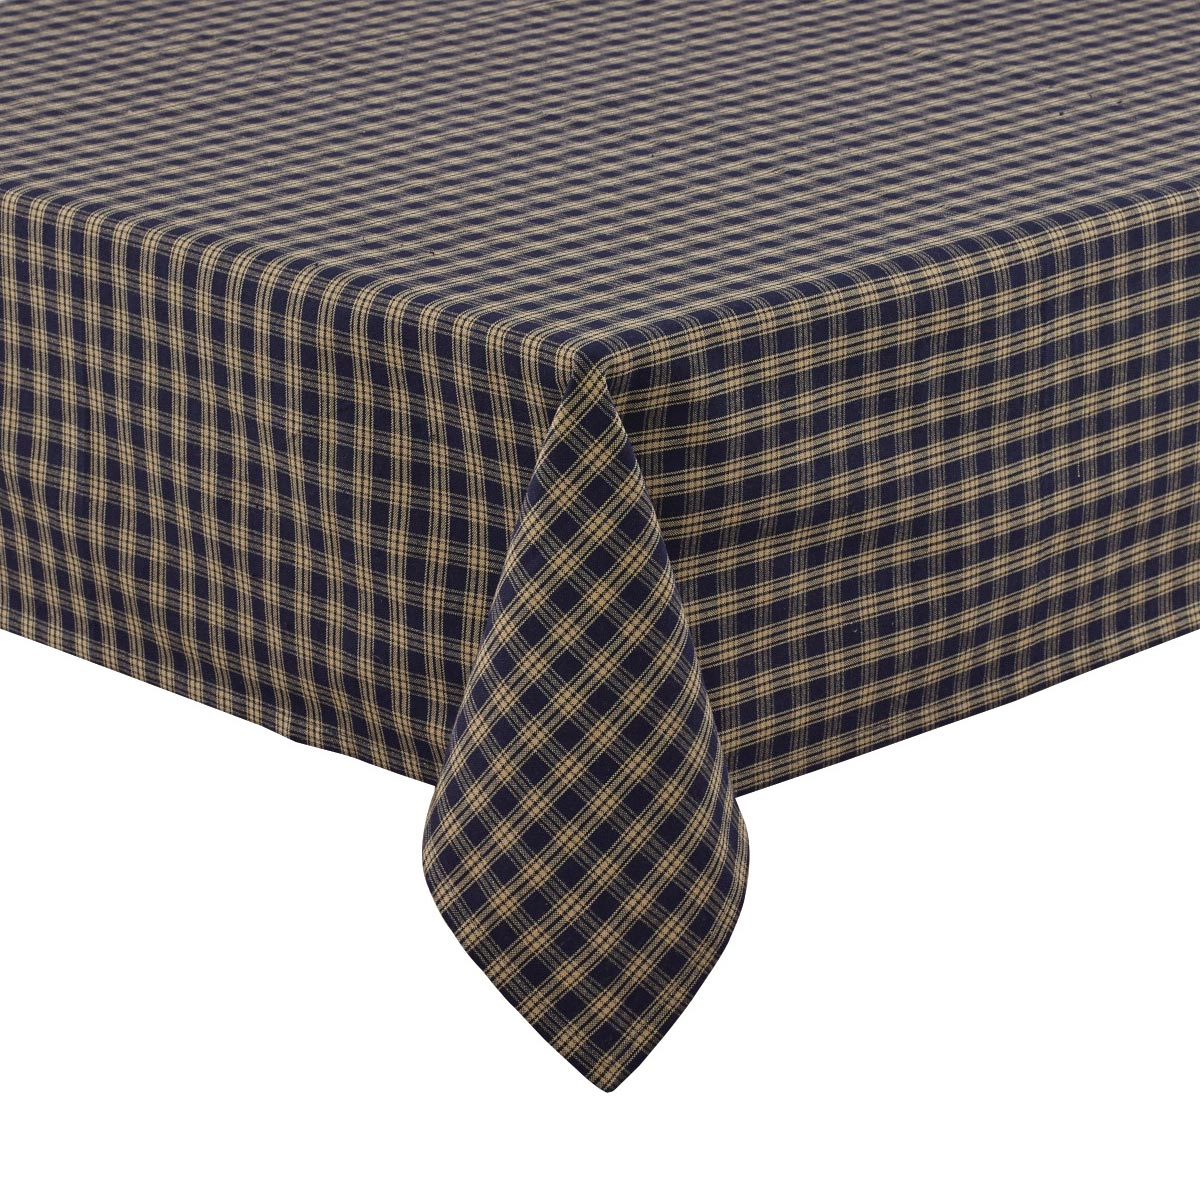 Table Cloth 54x54 In Navy Sturbridge Plaid Square 100 Cotton Park Designs